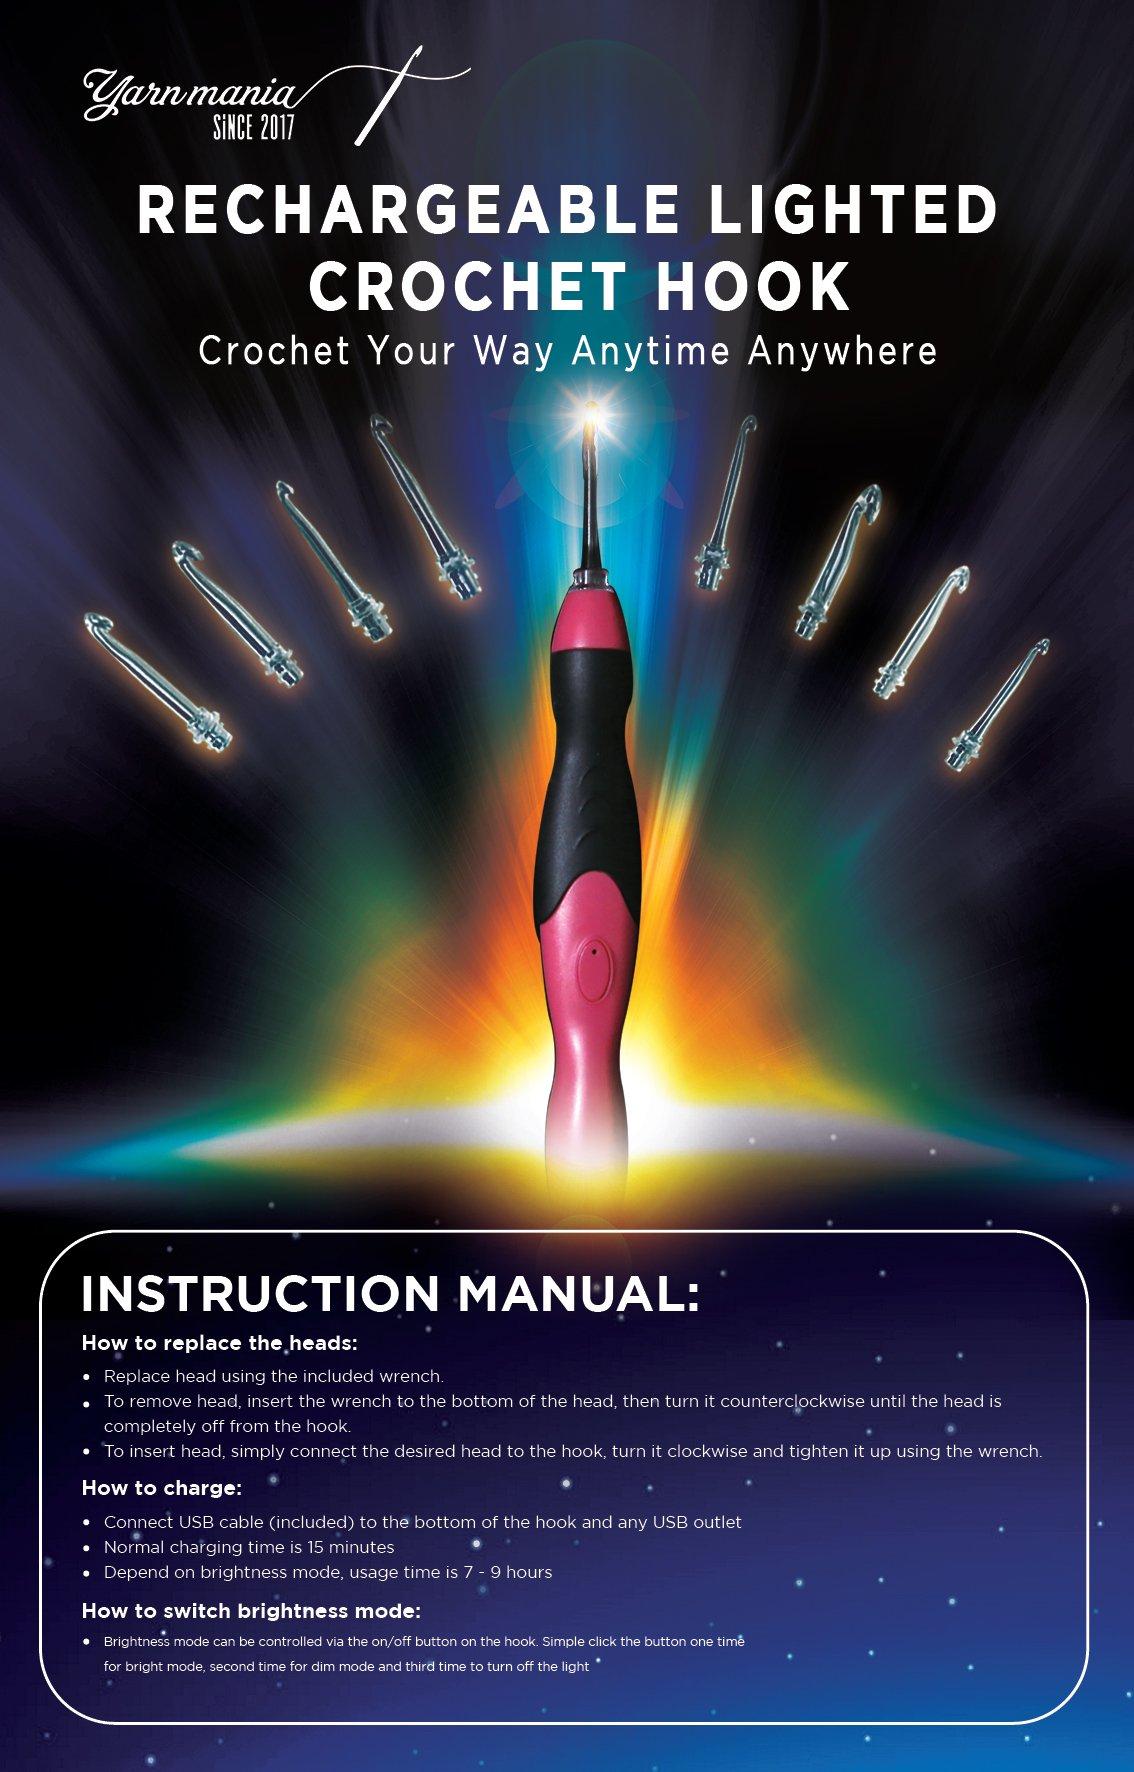 Yarn Mania Light Up Crochet Hooks - 9 Interchangeable Lighted Crochet Hooks (2.5mm - 6.5mm) - Bonus Accessories and Case (Purple) by Yarn Mania (Image #2)